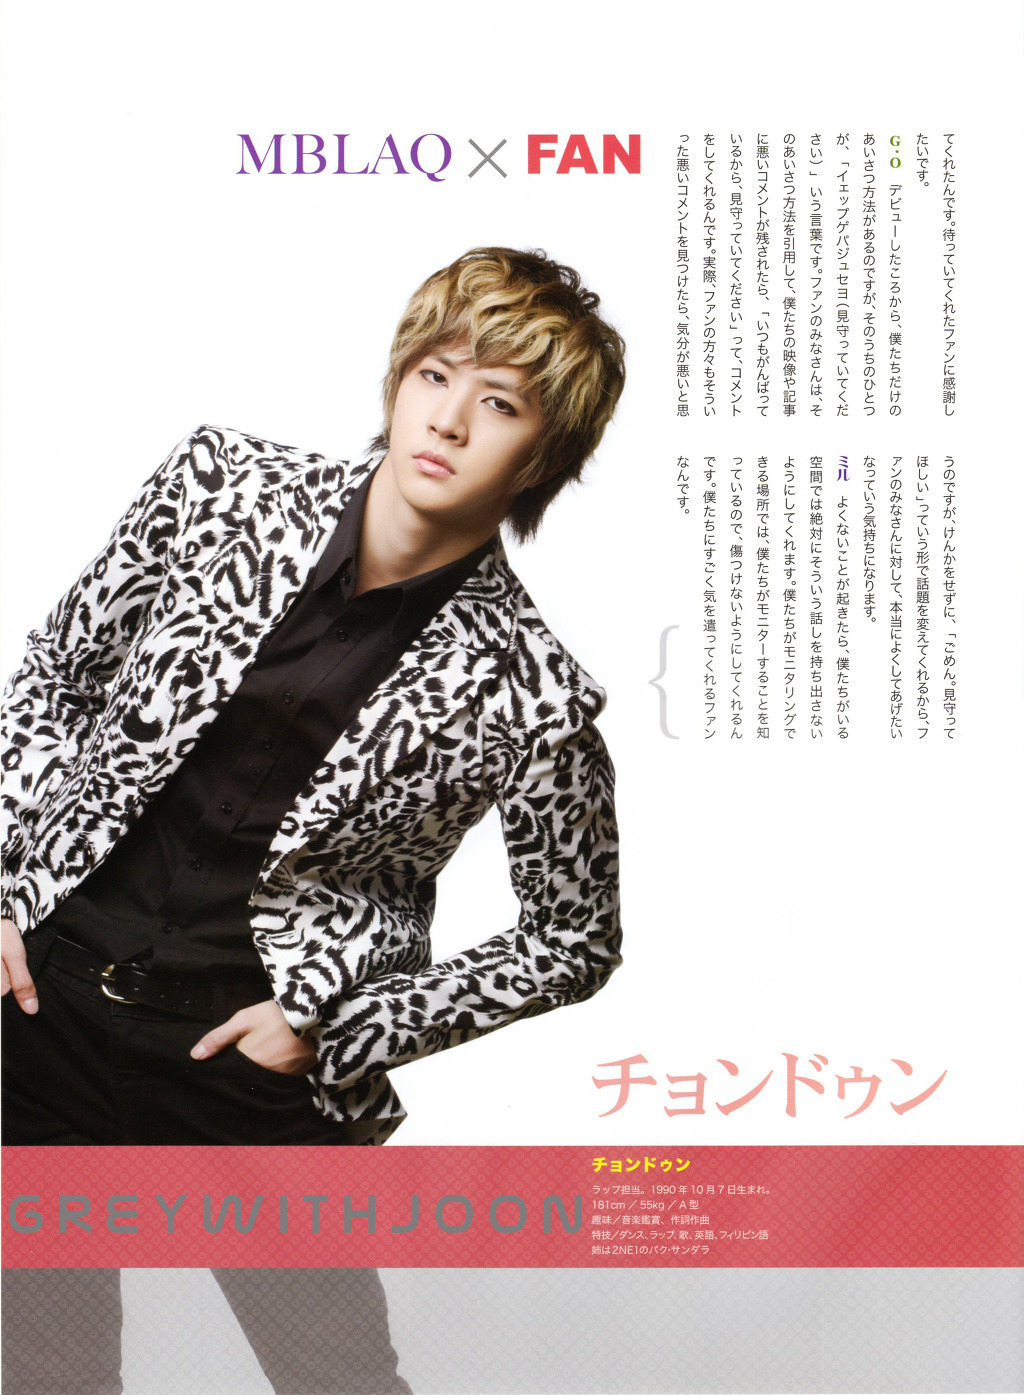 [01.03.11]MBLAQ @ CREA STAR Scan14